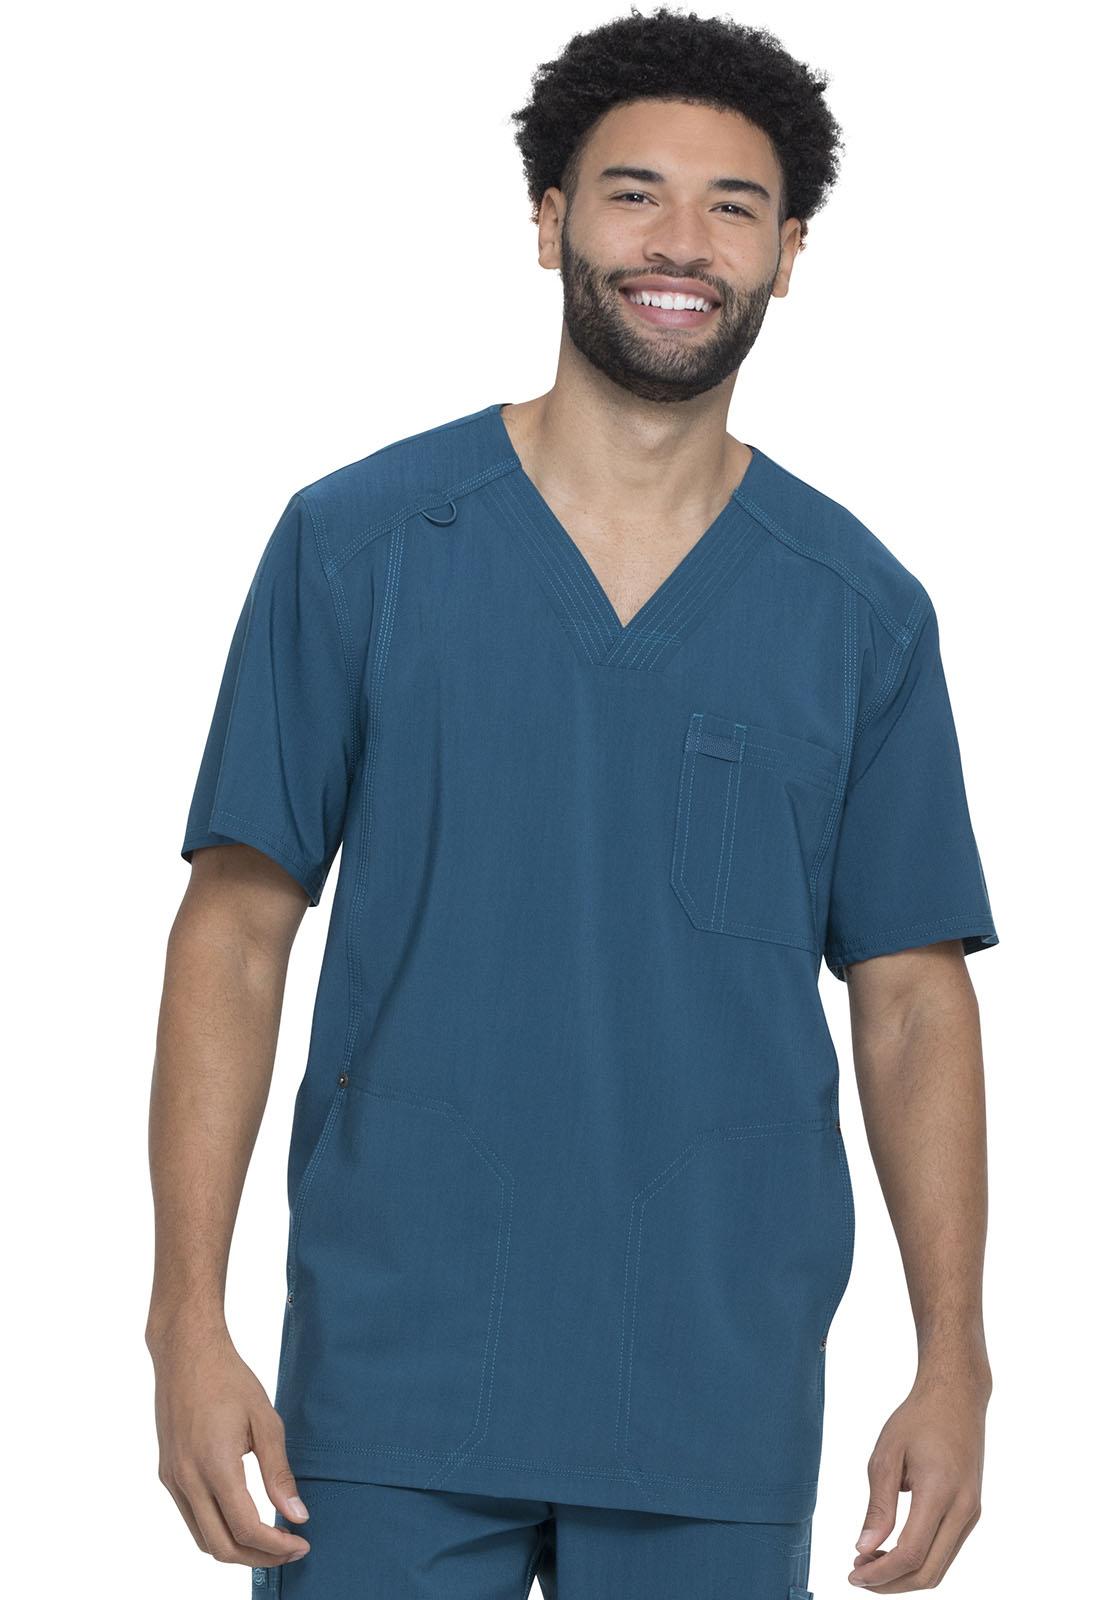 Dickies Advance Scrubs Men/'s V-Neck Top